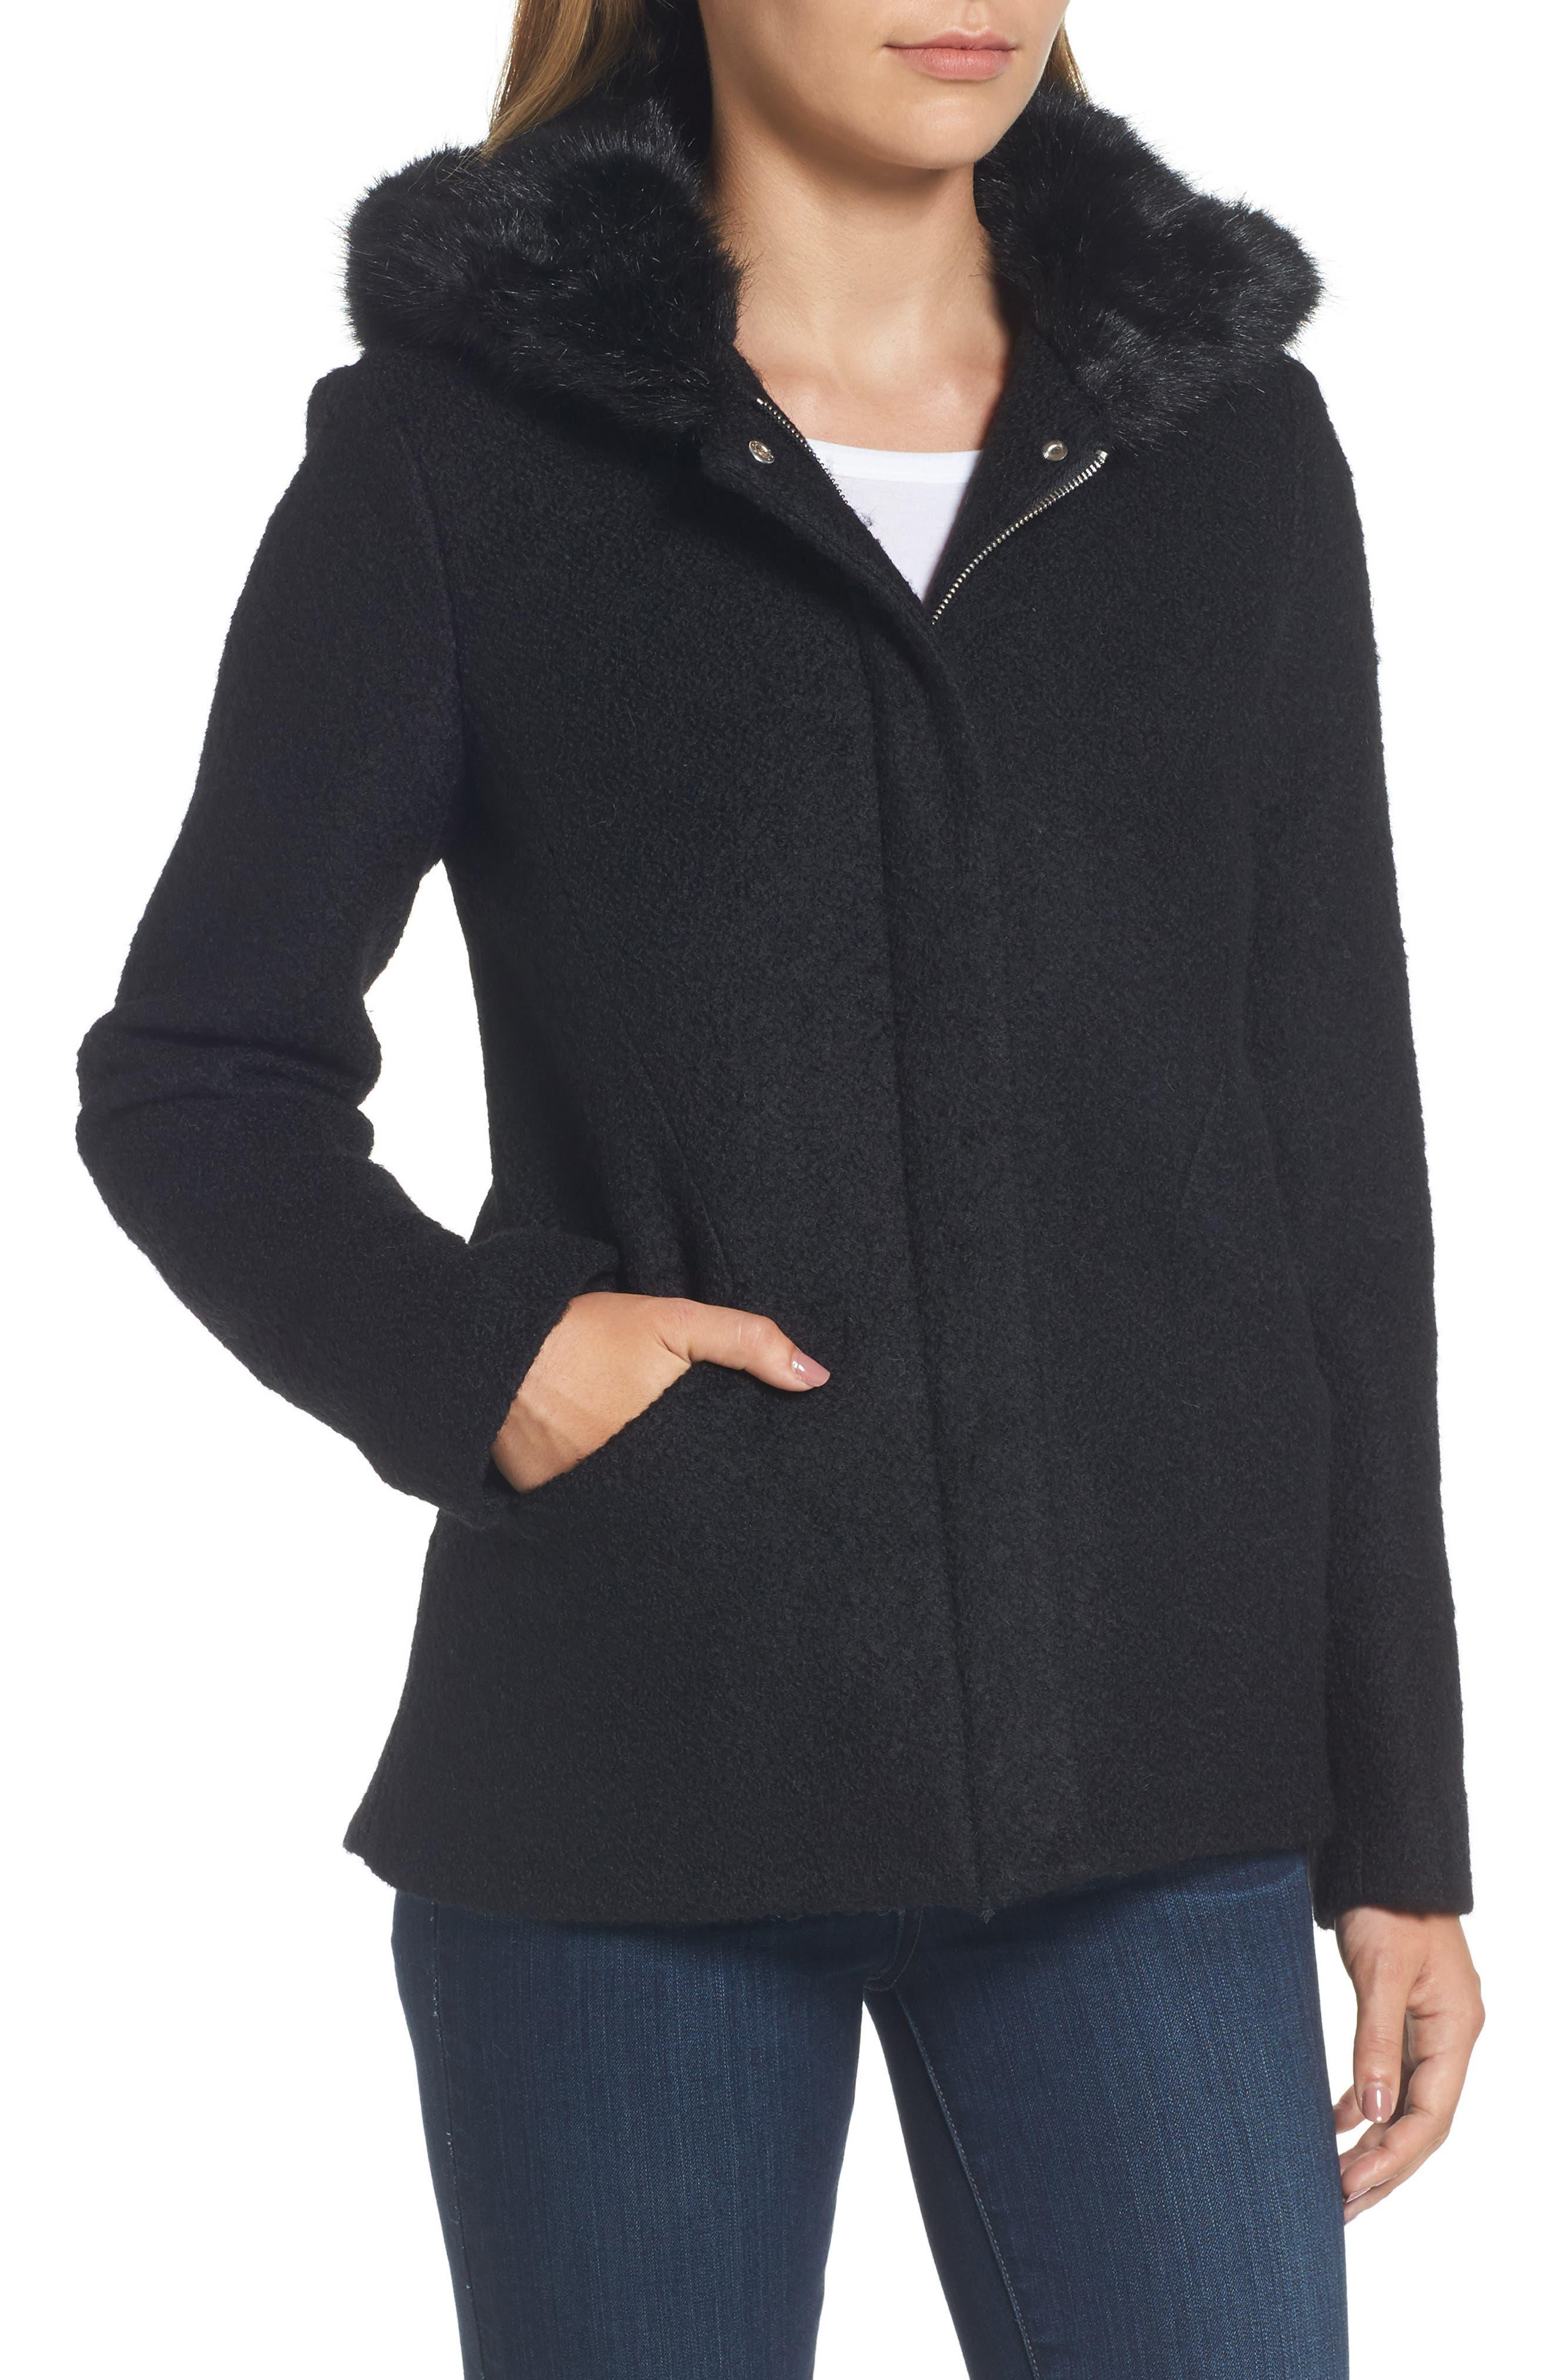 Hooded Wool Blend Bouclé Jacket with Faux Fur Trim,                             Alternate thumbnail 4, color,                             001